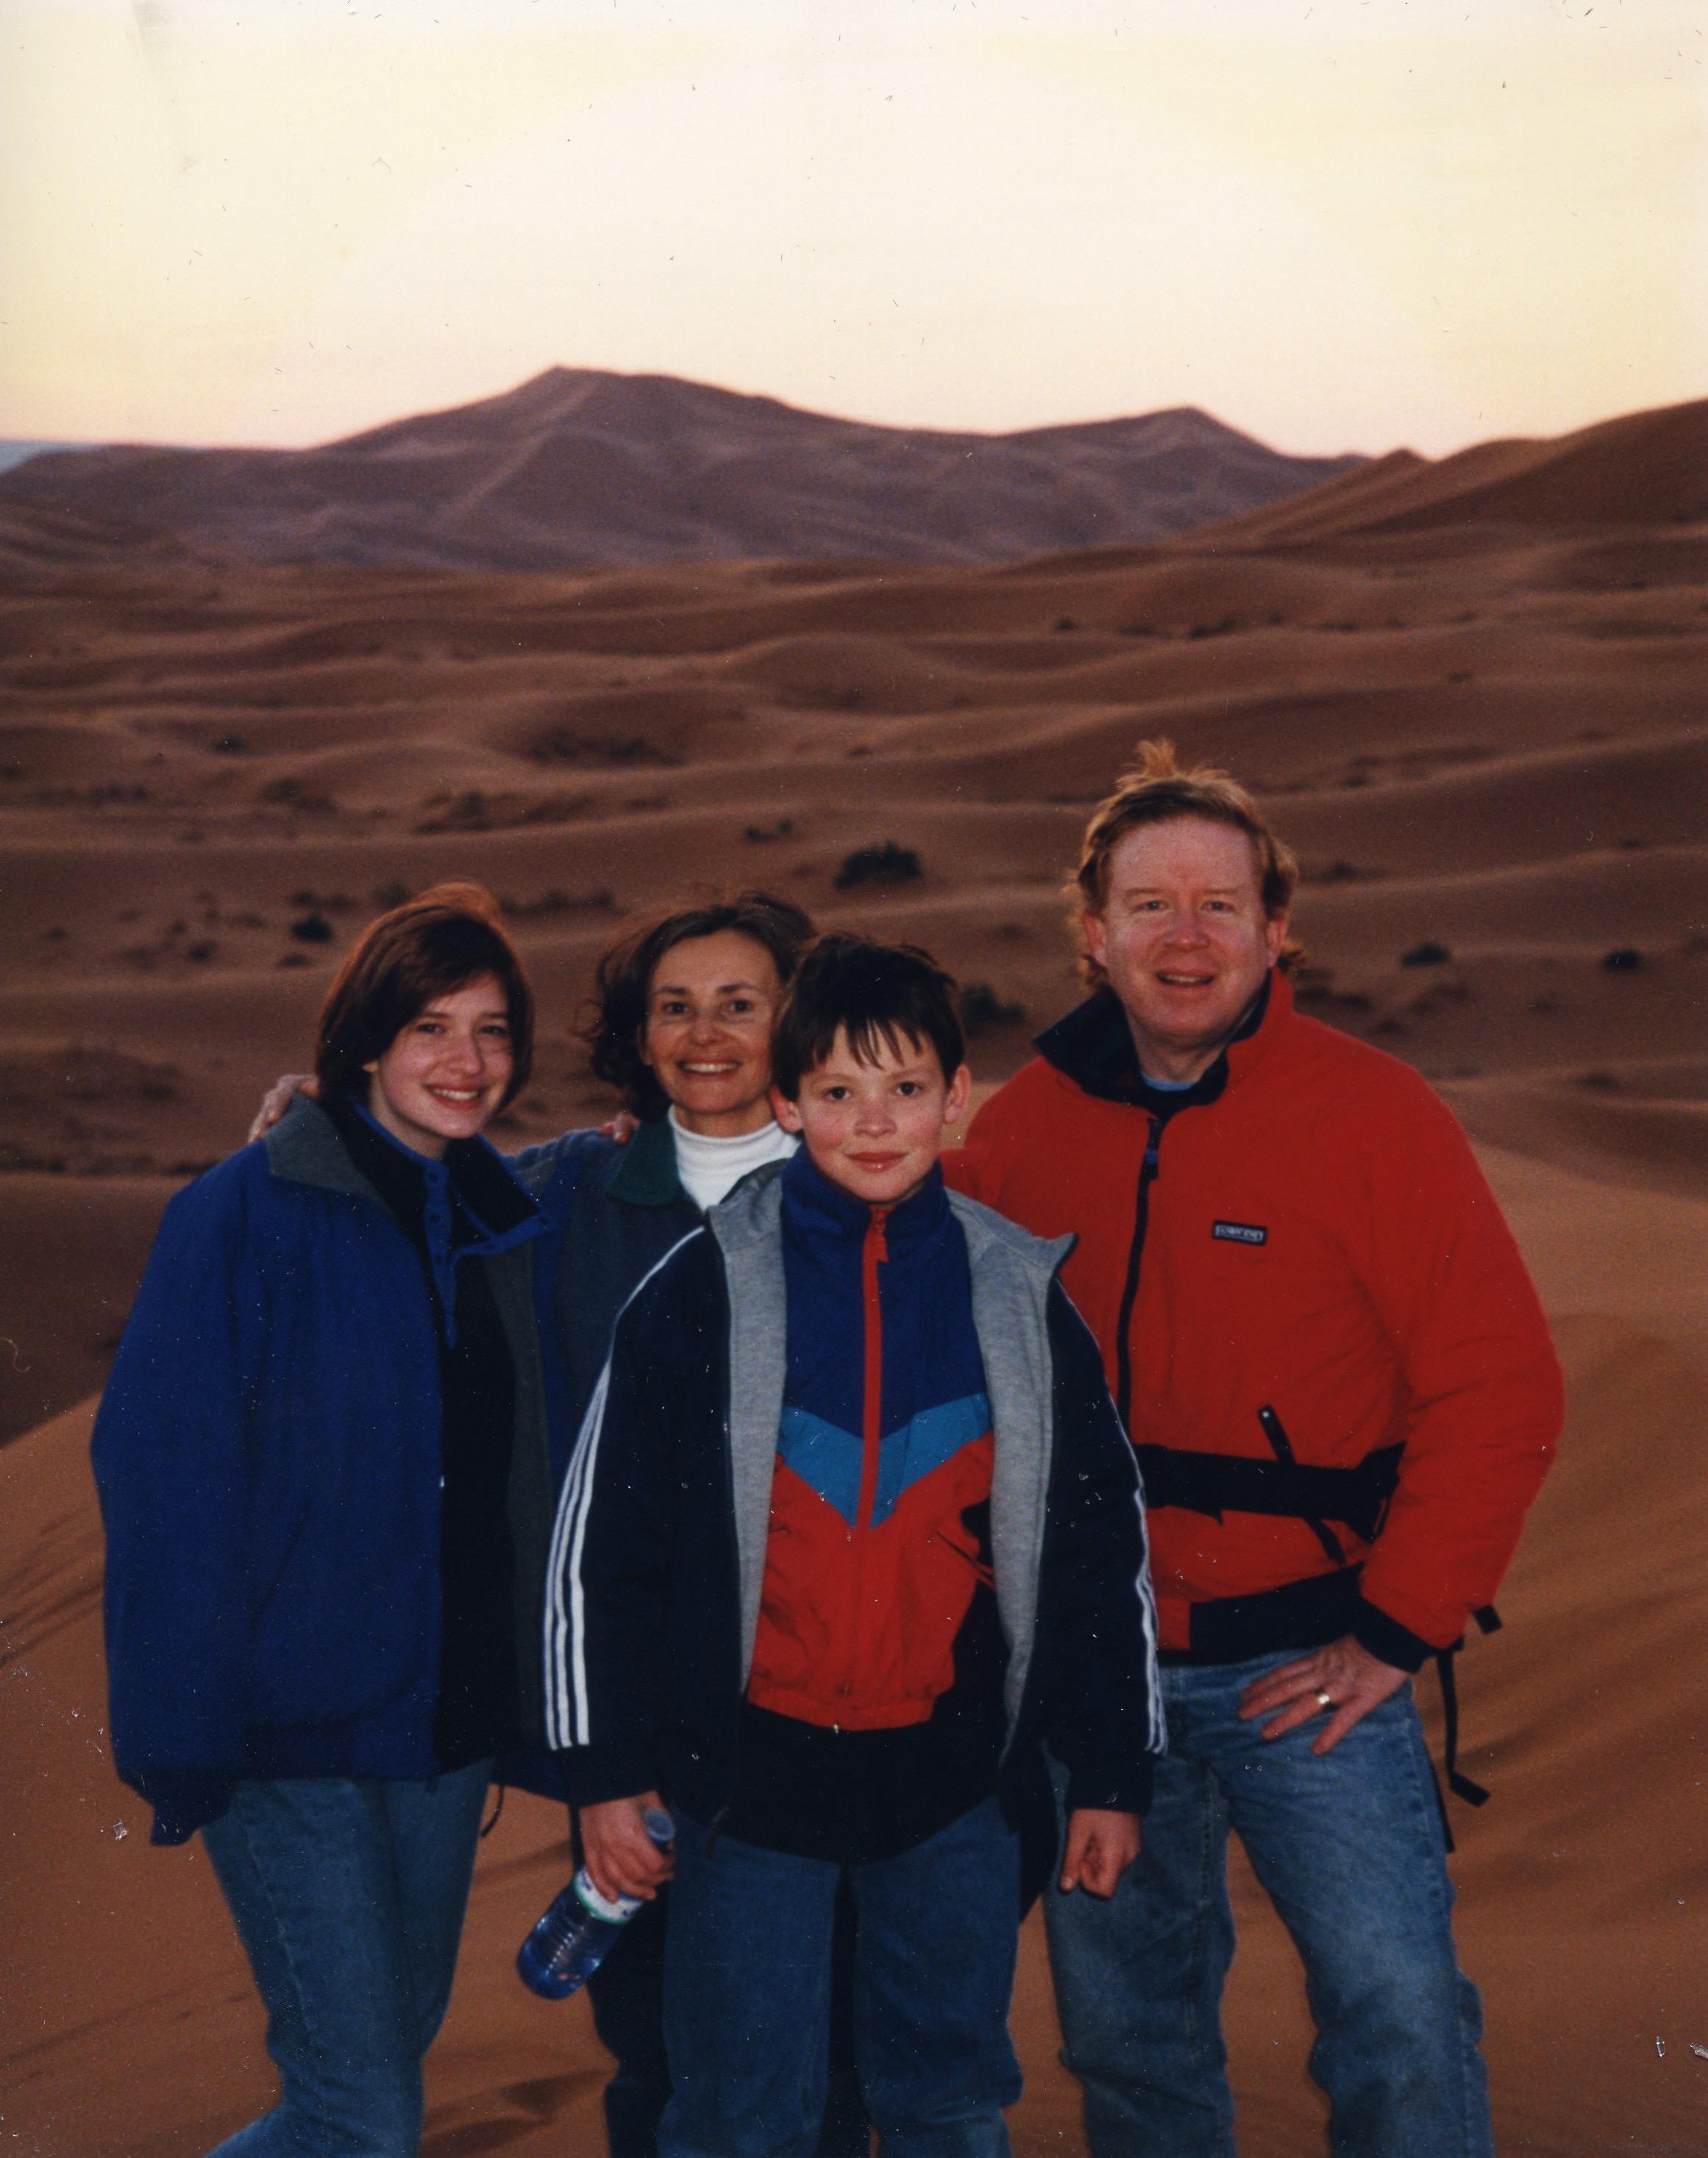 Erg Chebi, Moroccan Sahara